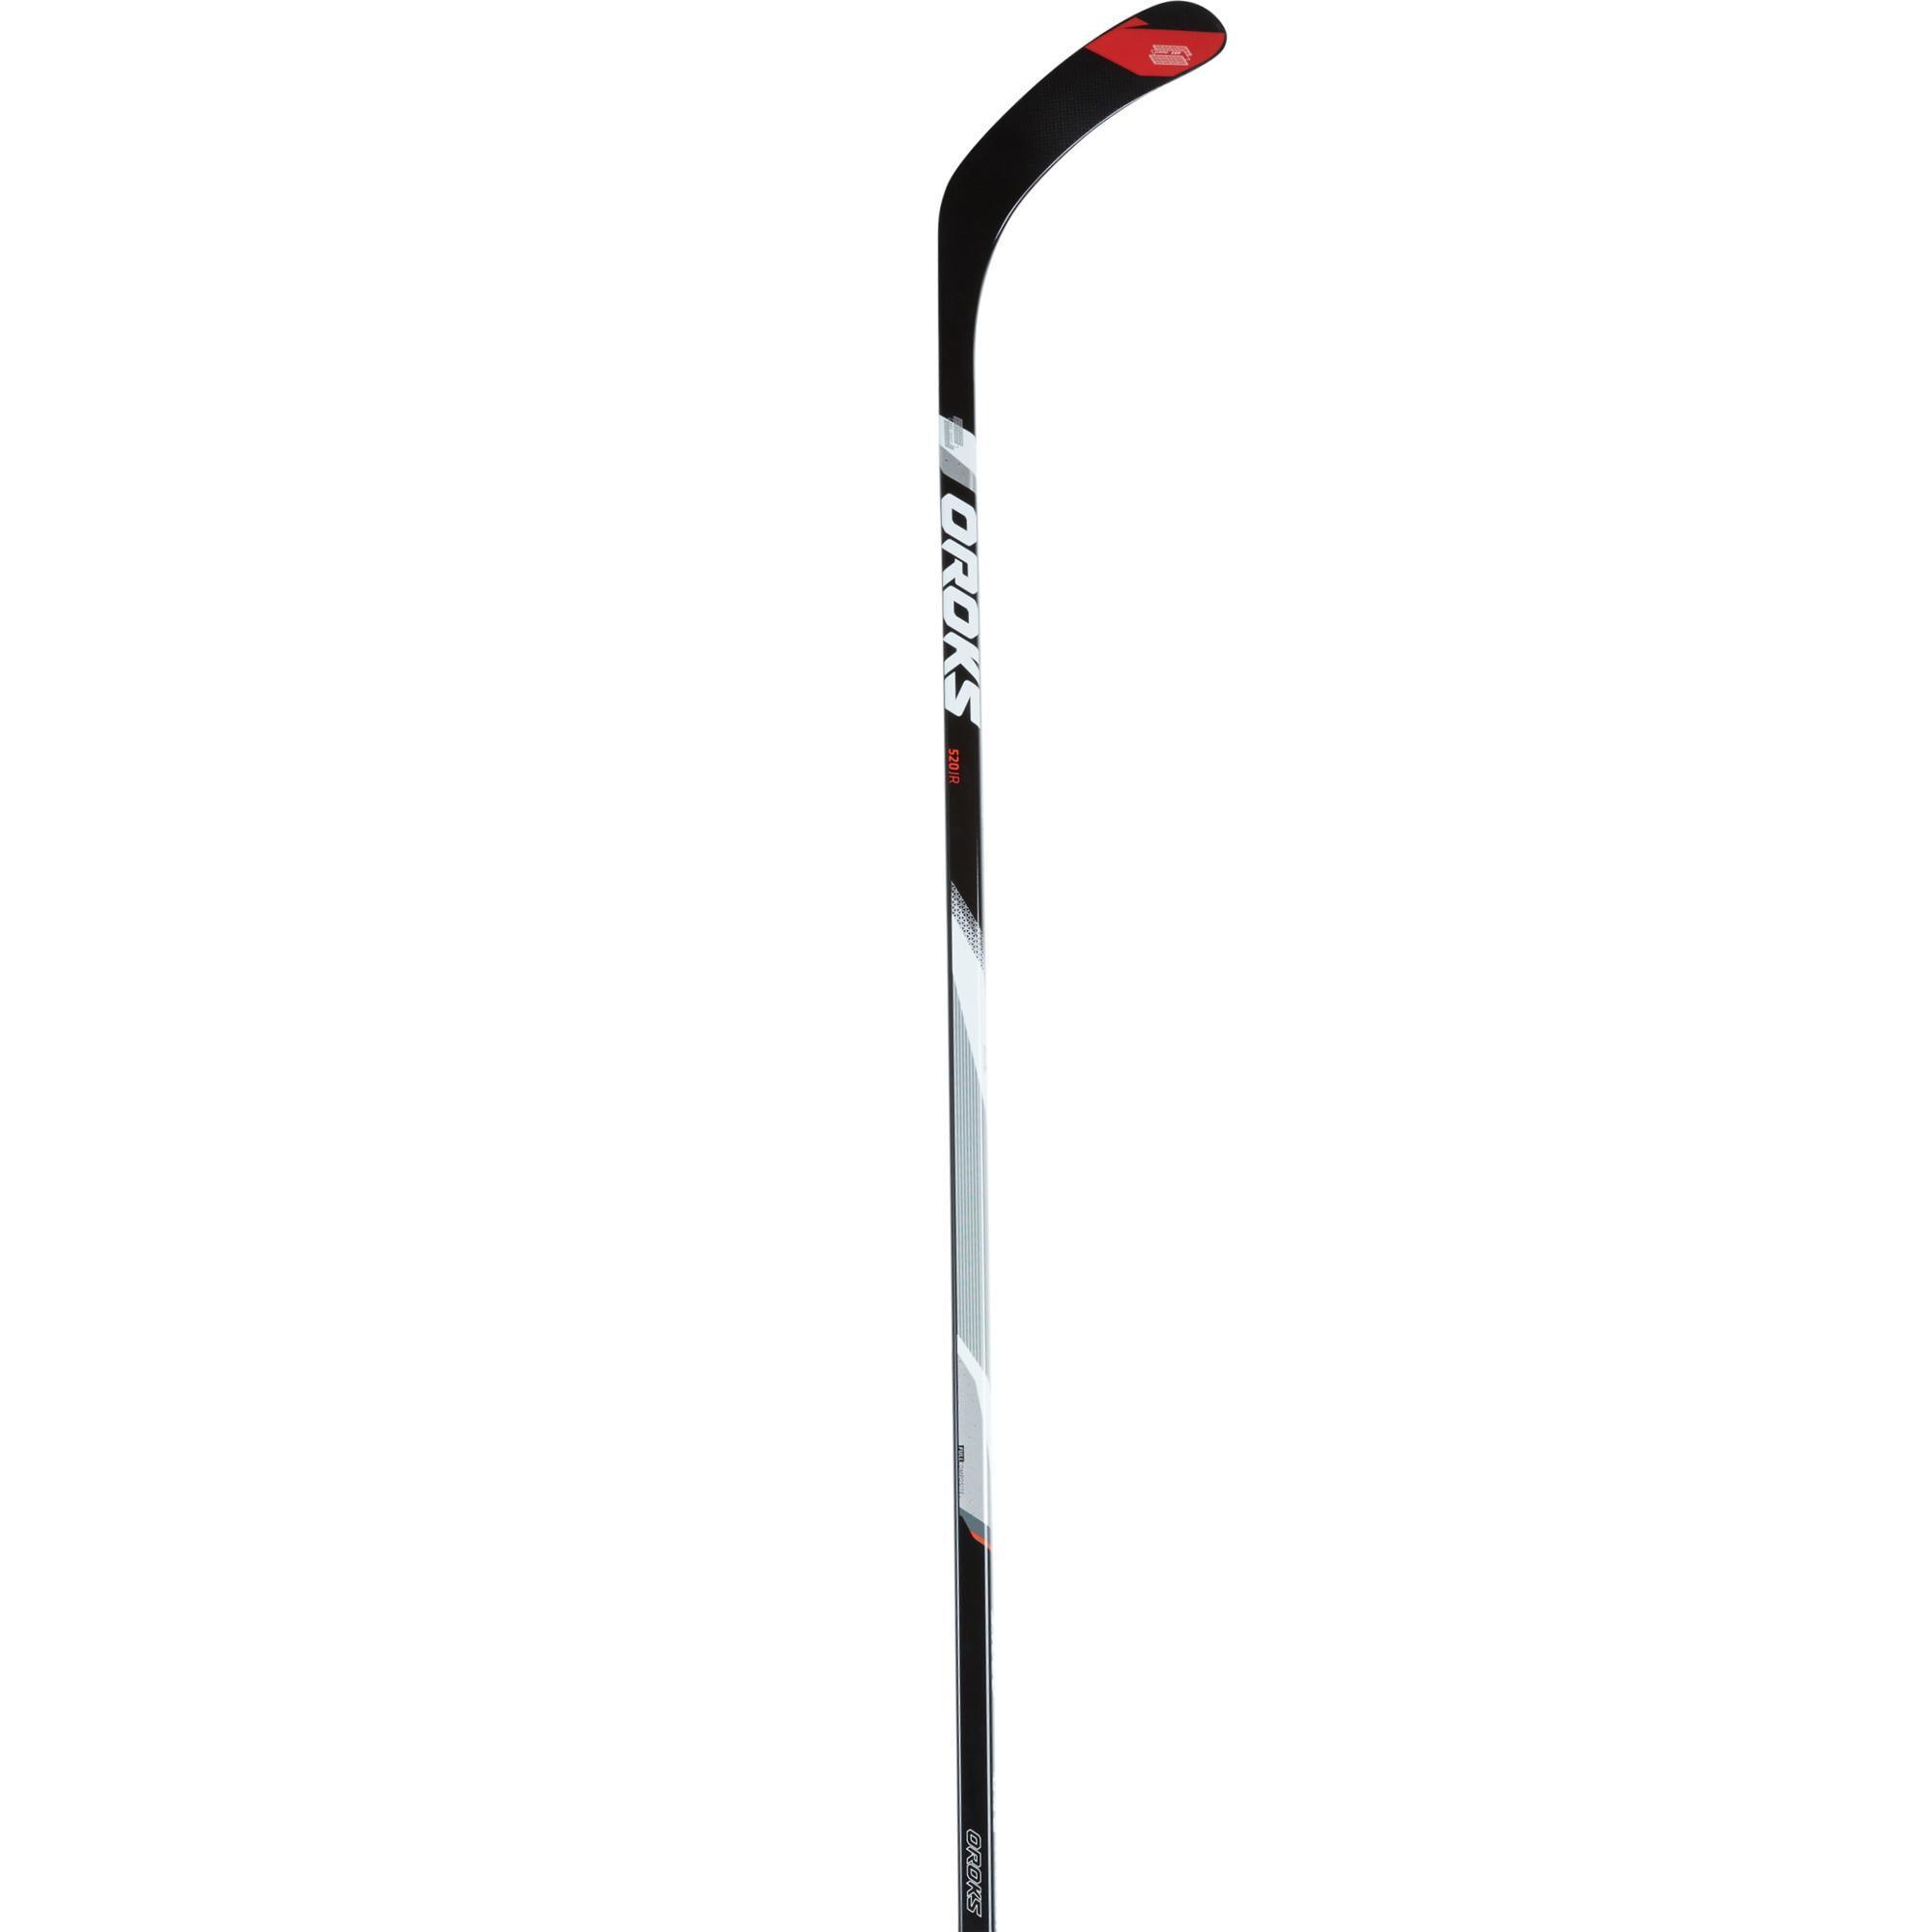 89b2a6795fd ▷ Hockeystick kinderen kopen? | Online Internetwinkel